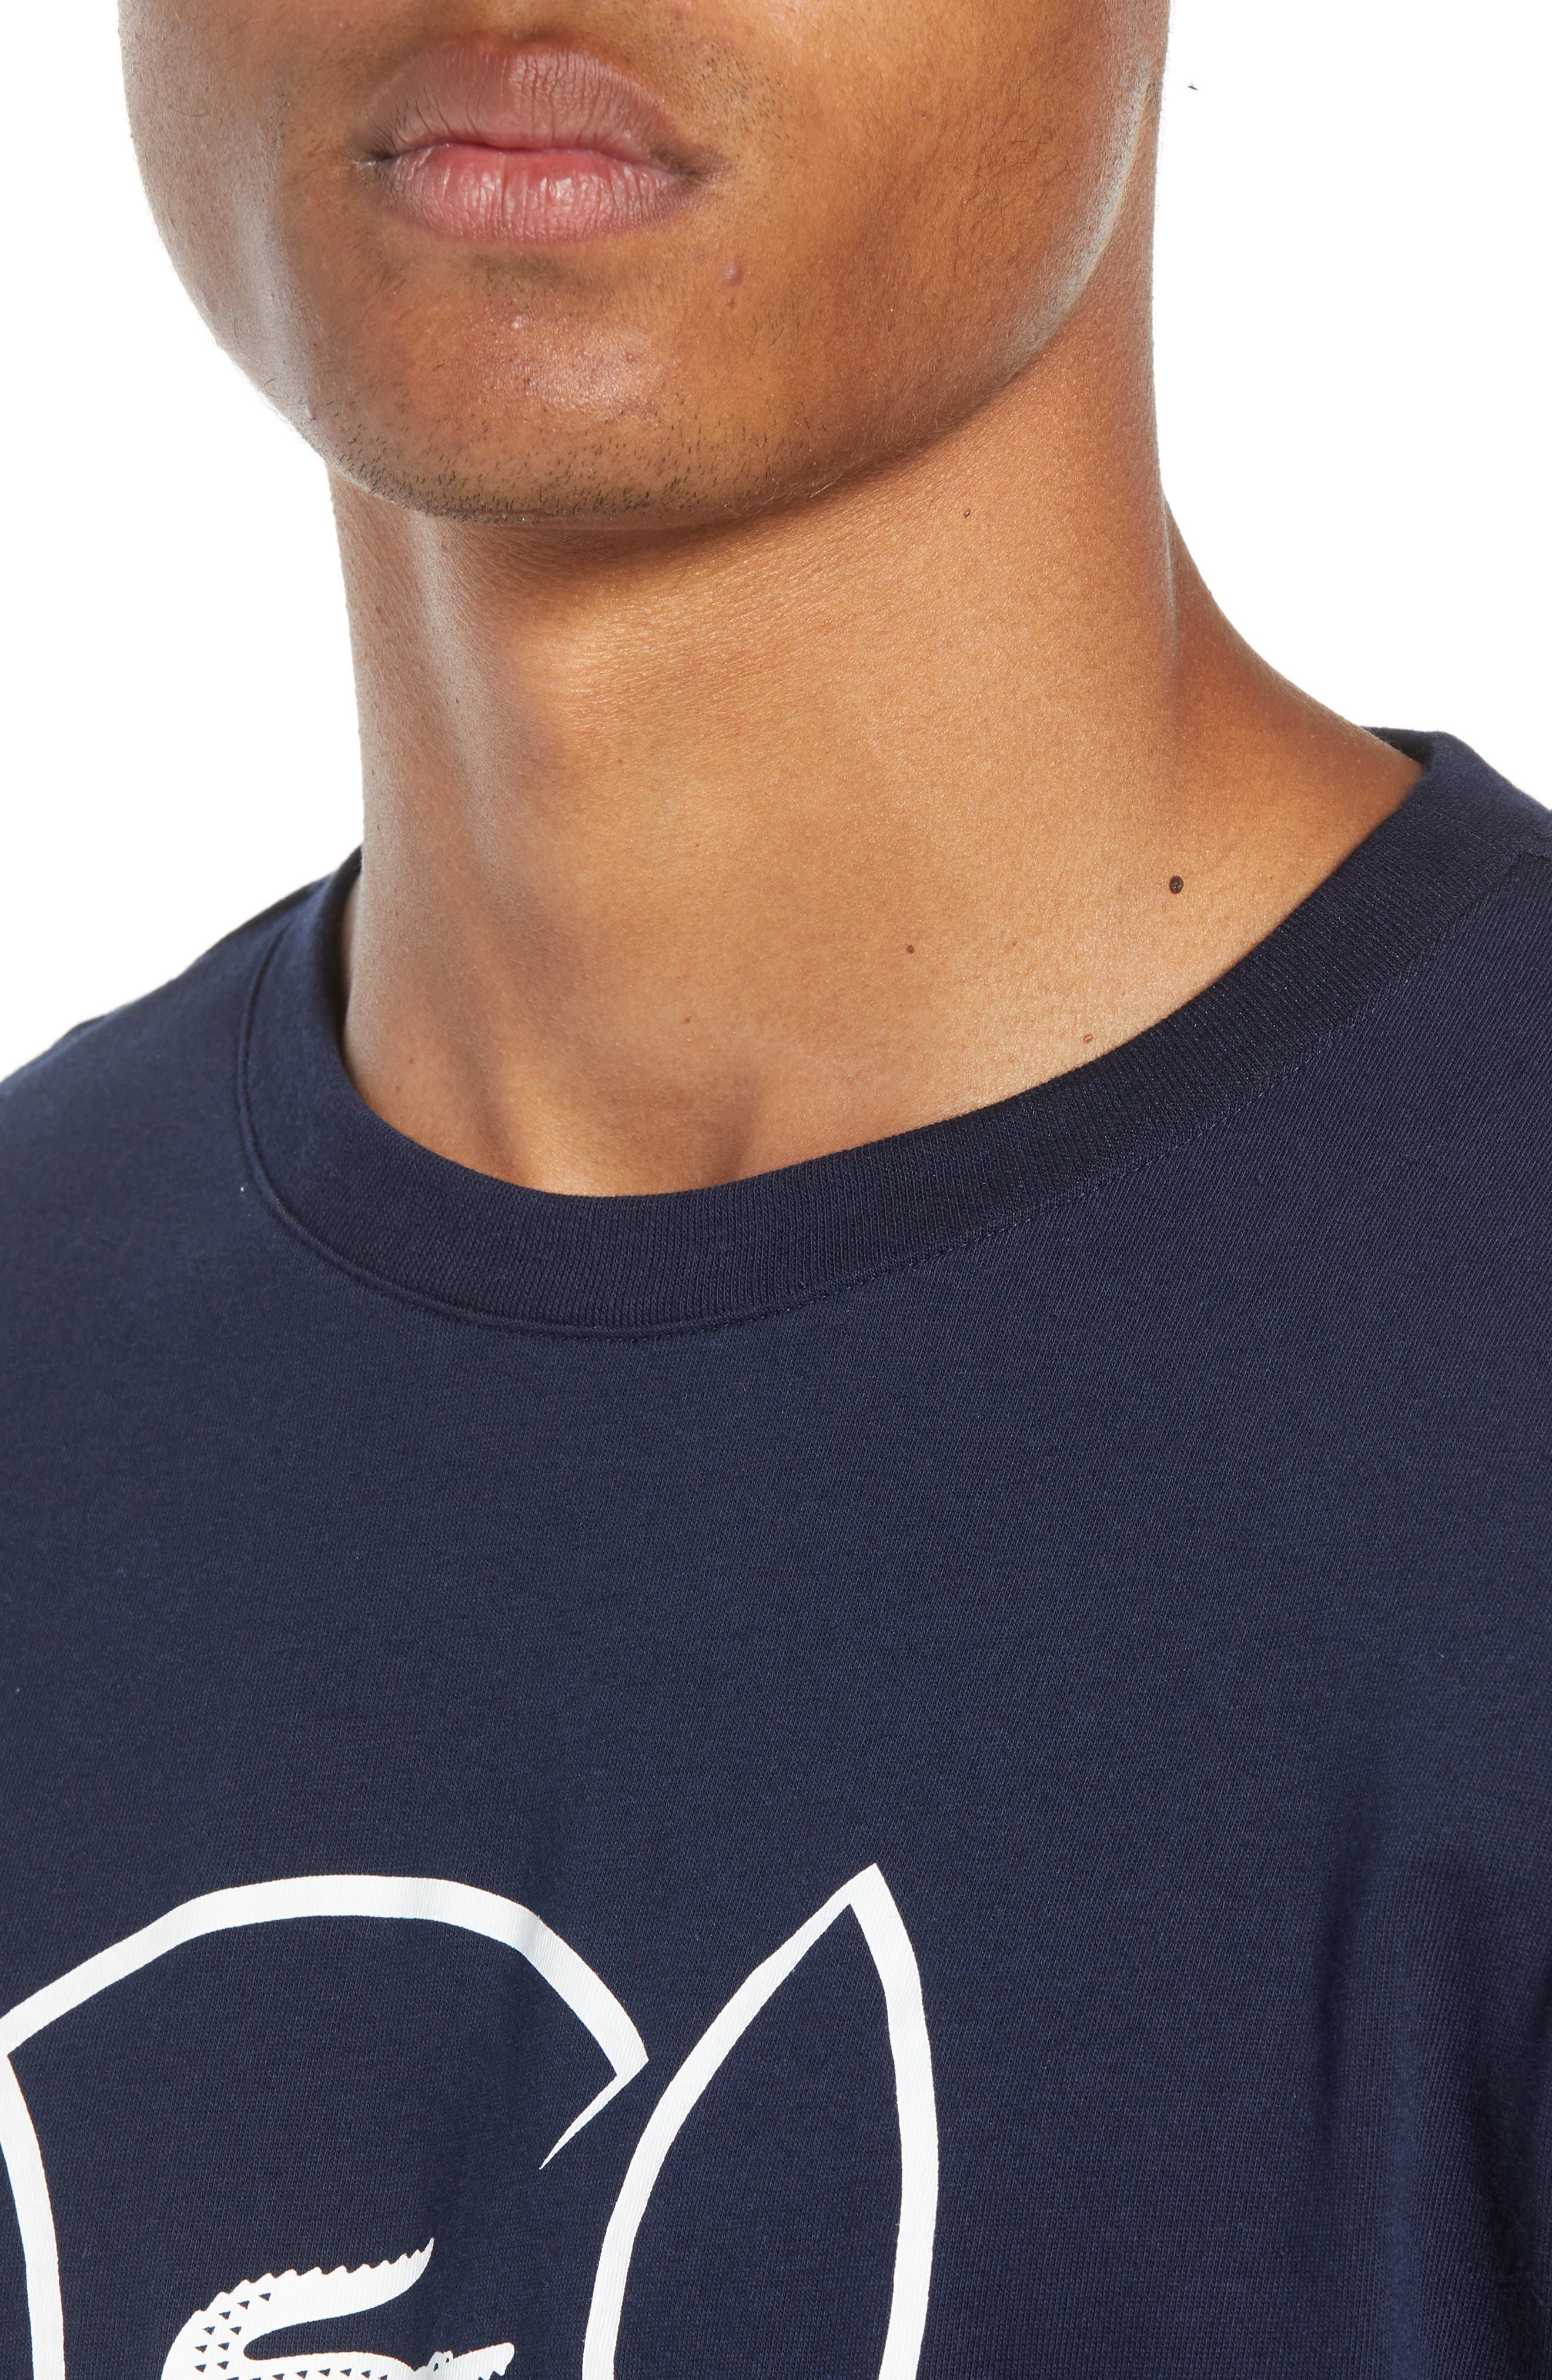 Tech Jersey Regular Fit Tee,                             Alternate thumbnail 4, color,                             NAVY BLUE/ WHITE